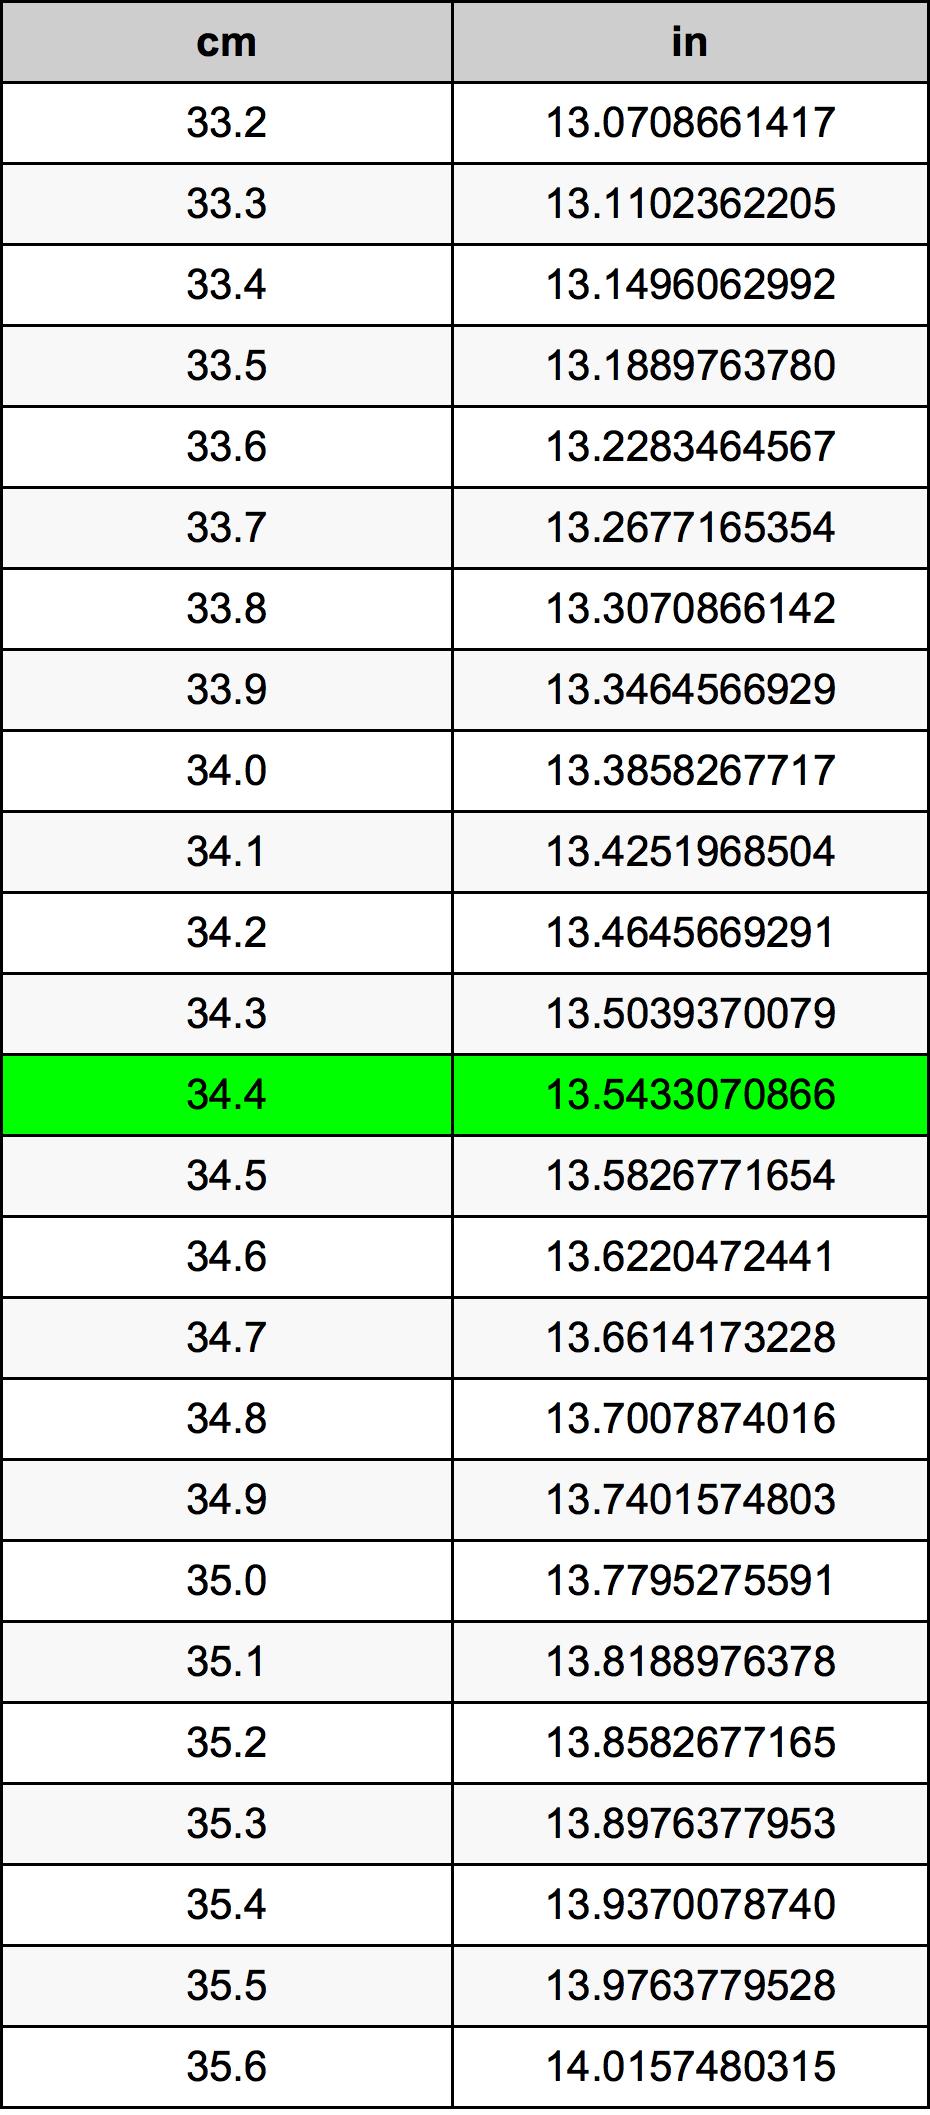 34.4 Centimeter konverteringstabellen